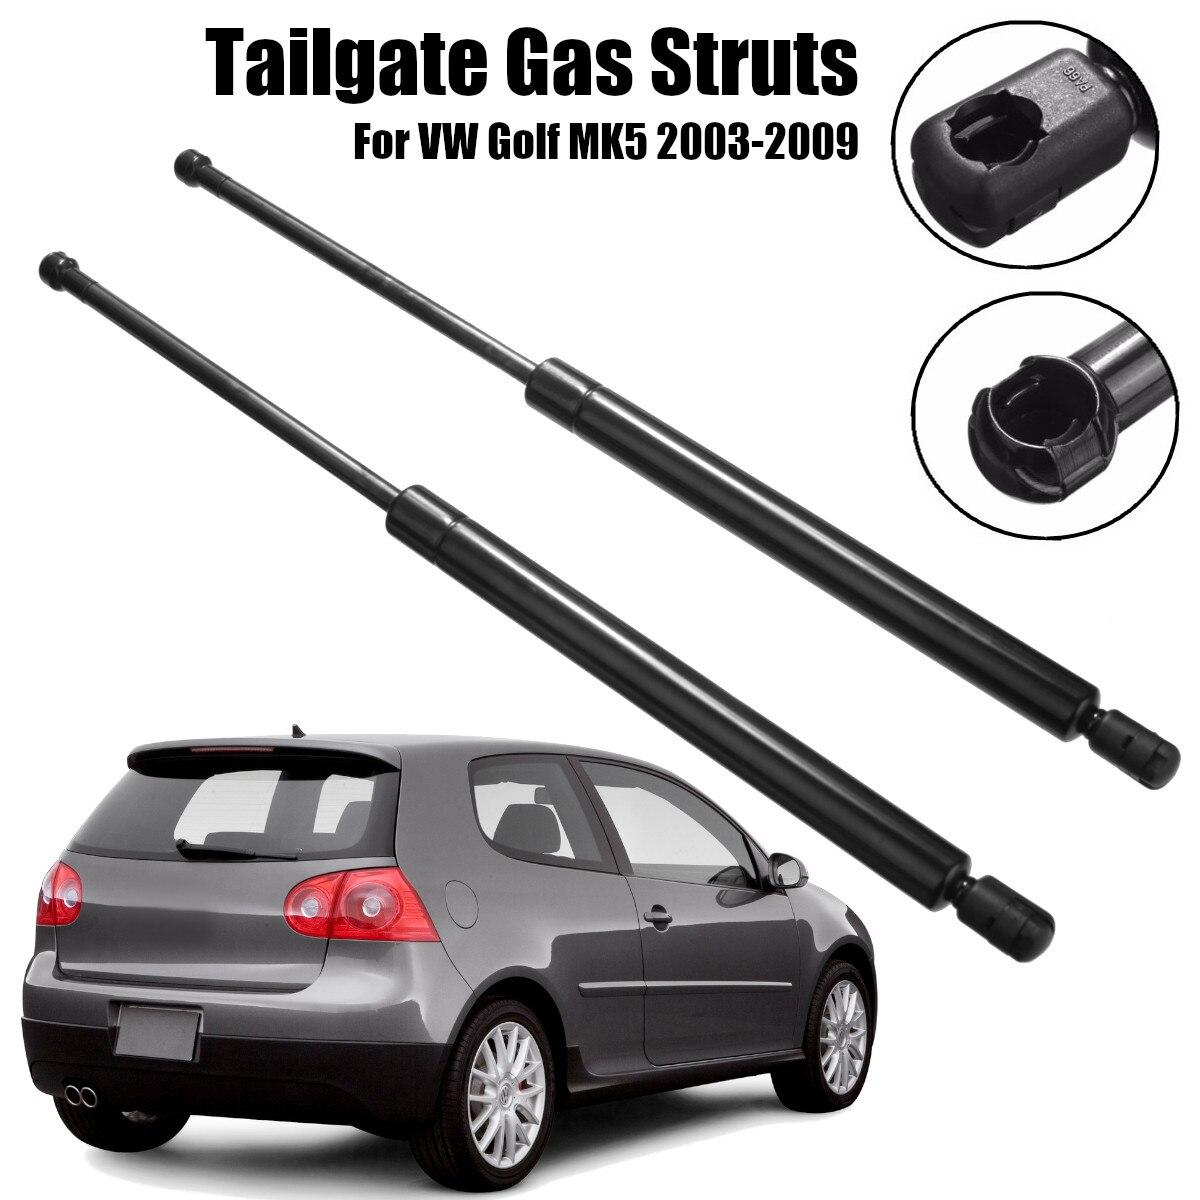 2pcs TAIL TAIL Gate แก๊ส Struts ผู้ถือ Lifter สนับสนุนสำหรับ VW Golf MK5 2003-2009 1K6827550D